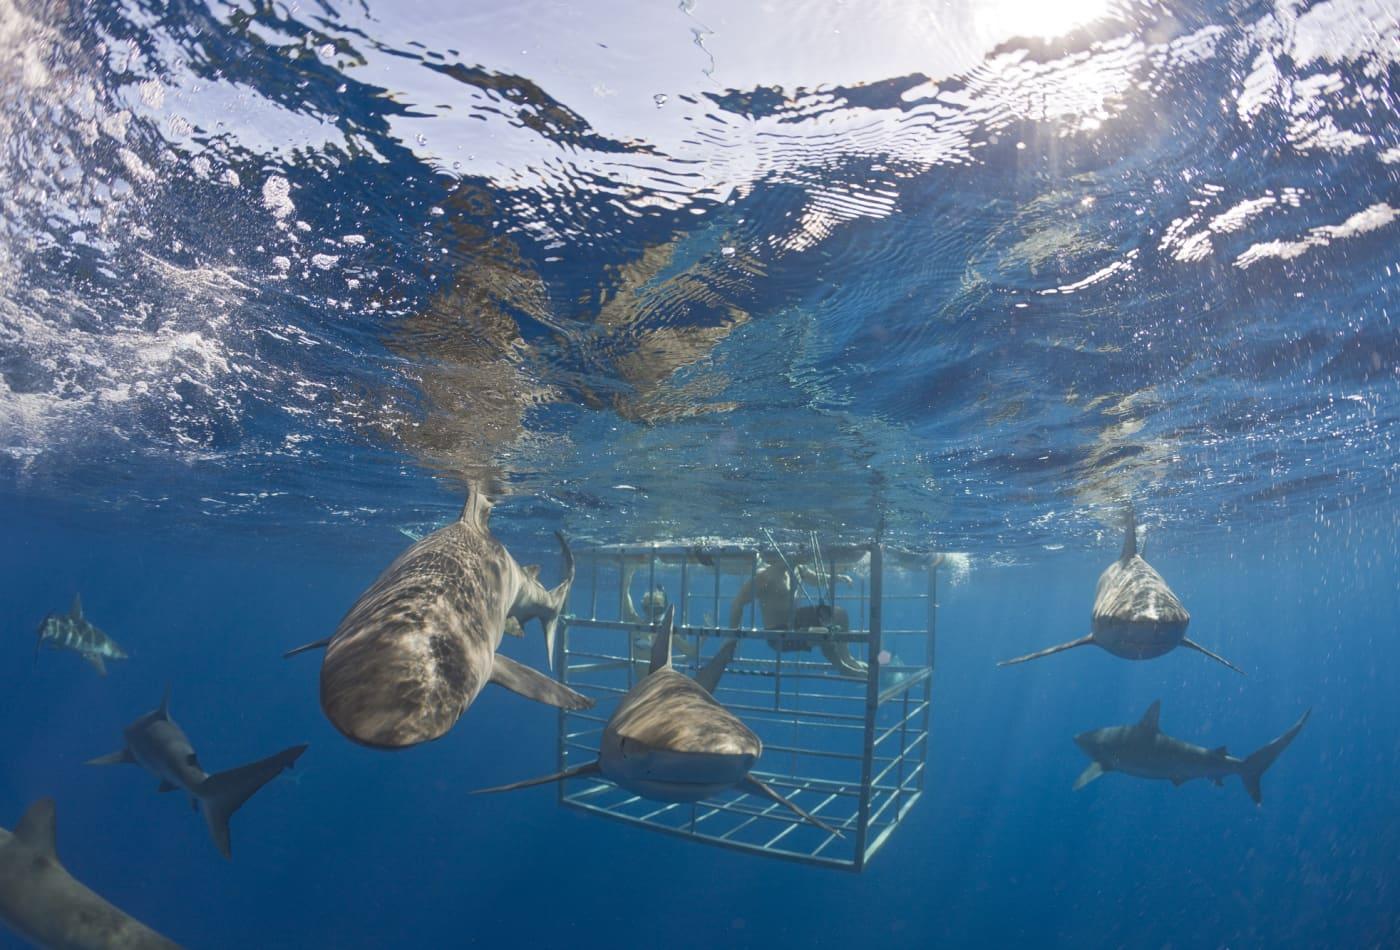 Where 'Shark Tank' stars Mark Cuban, Kevin O'Leary went for